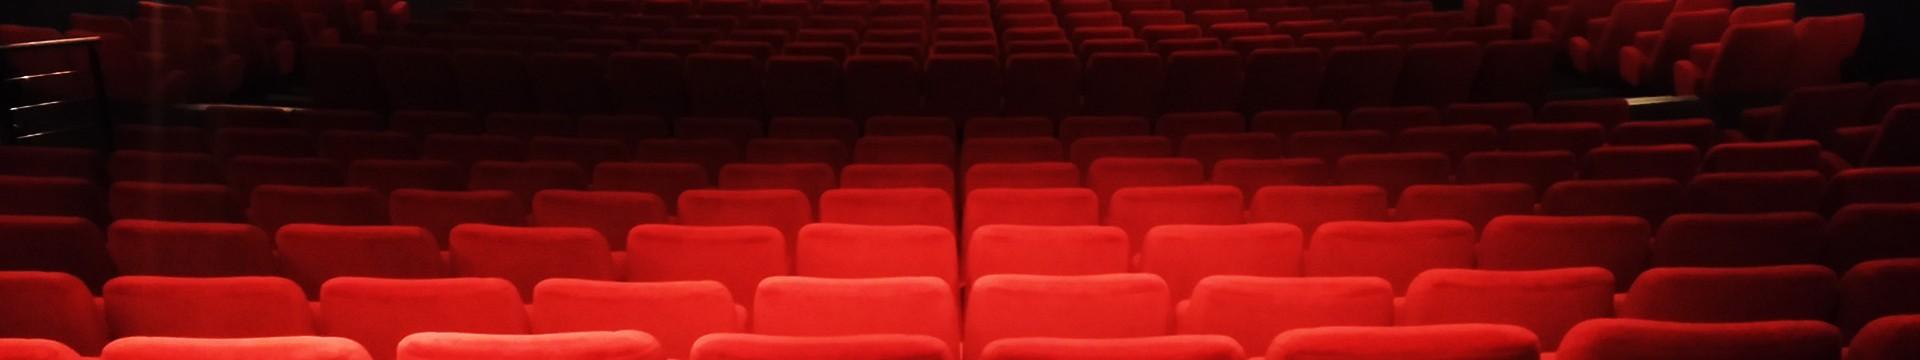 cinema-01-8958